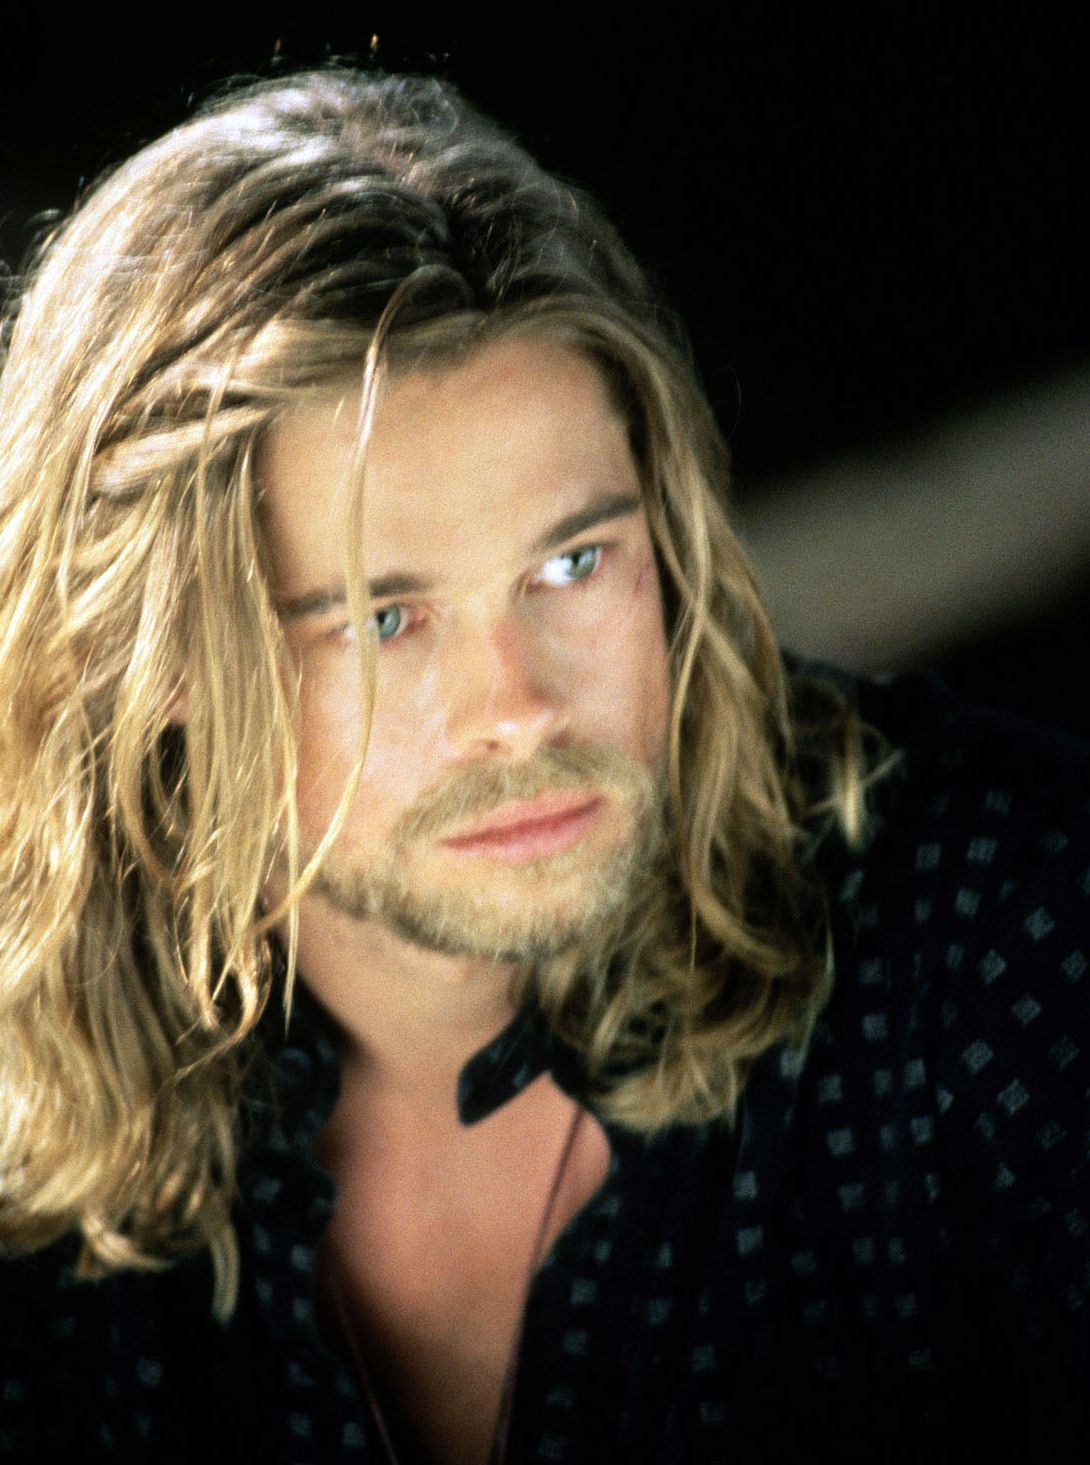 Brad Pitt Pic 144618 Brad Pitt Long Hair Brad Pitt Long Hair Styles Men